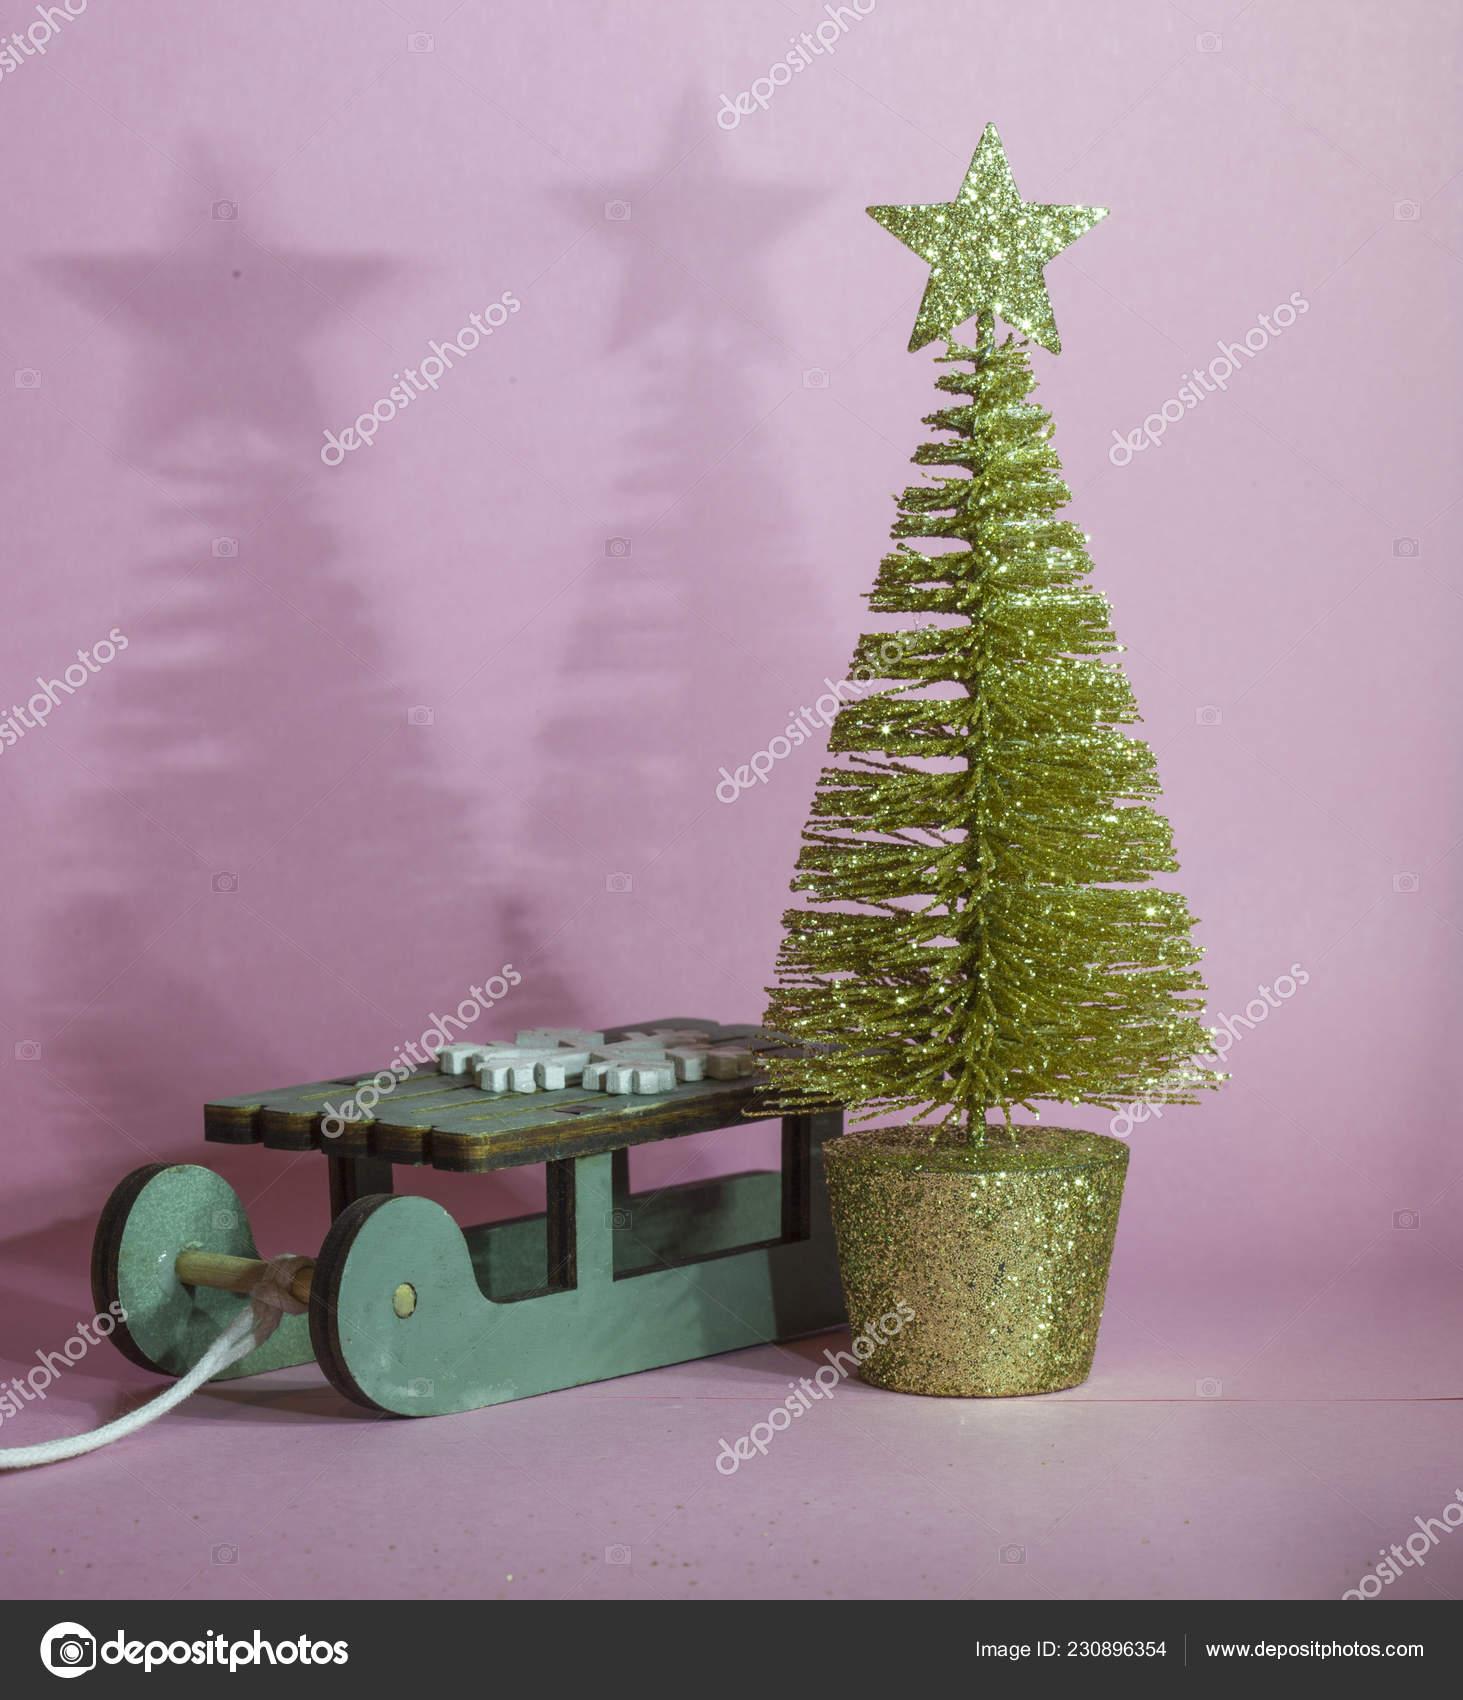 Golden Christmas Tree Wooden Sled Pink Background Festive